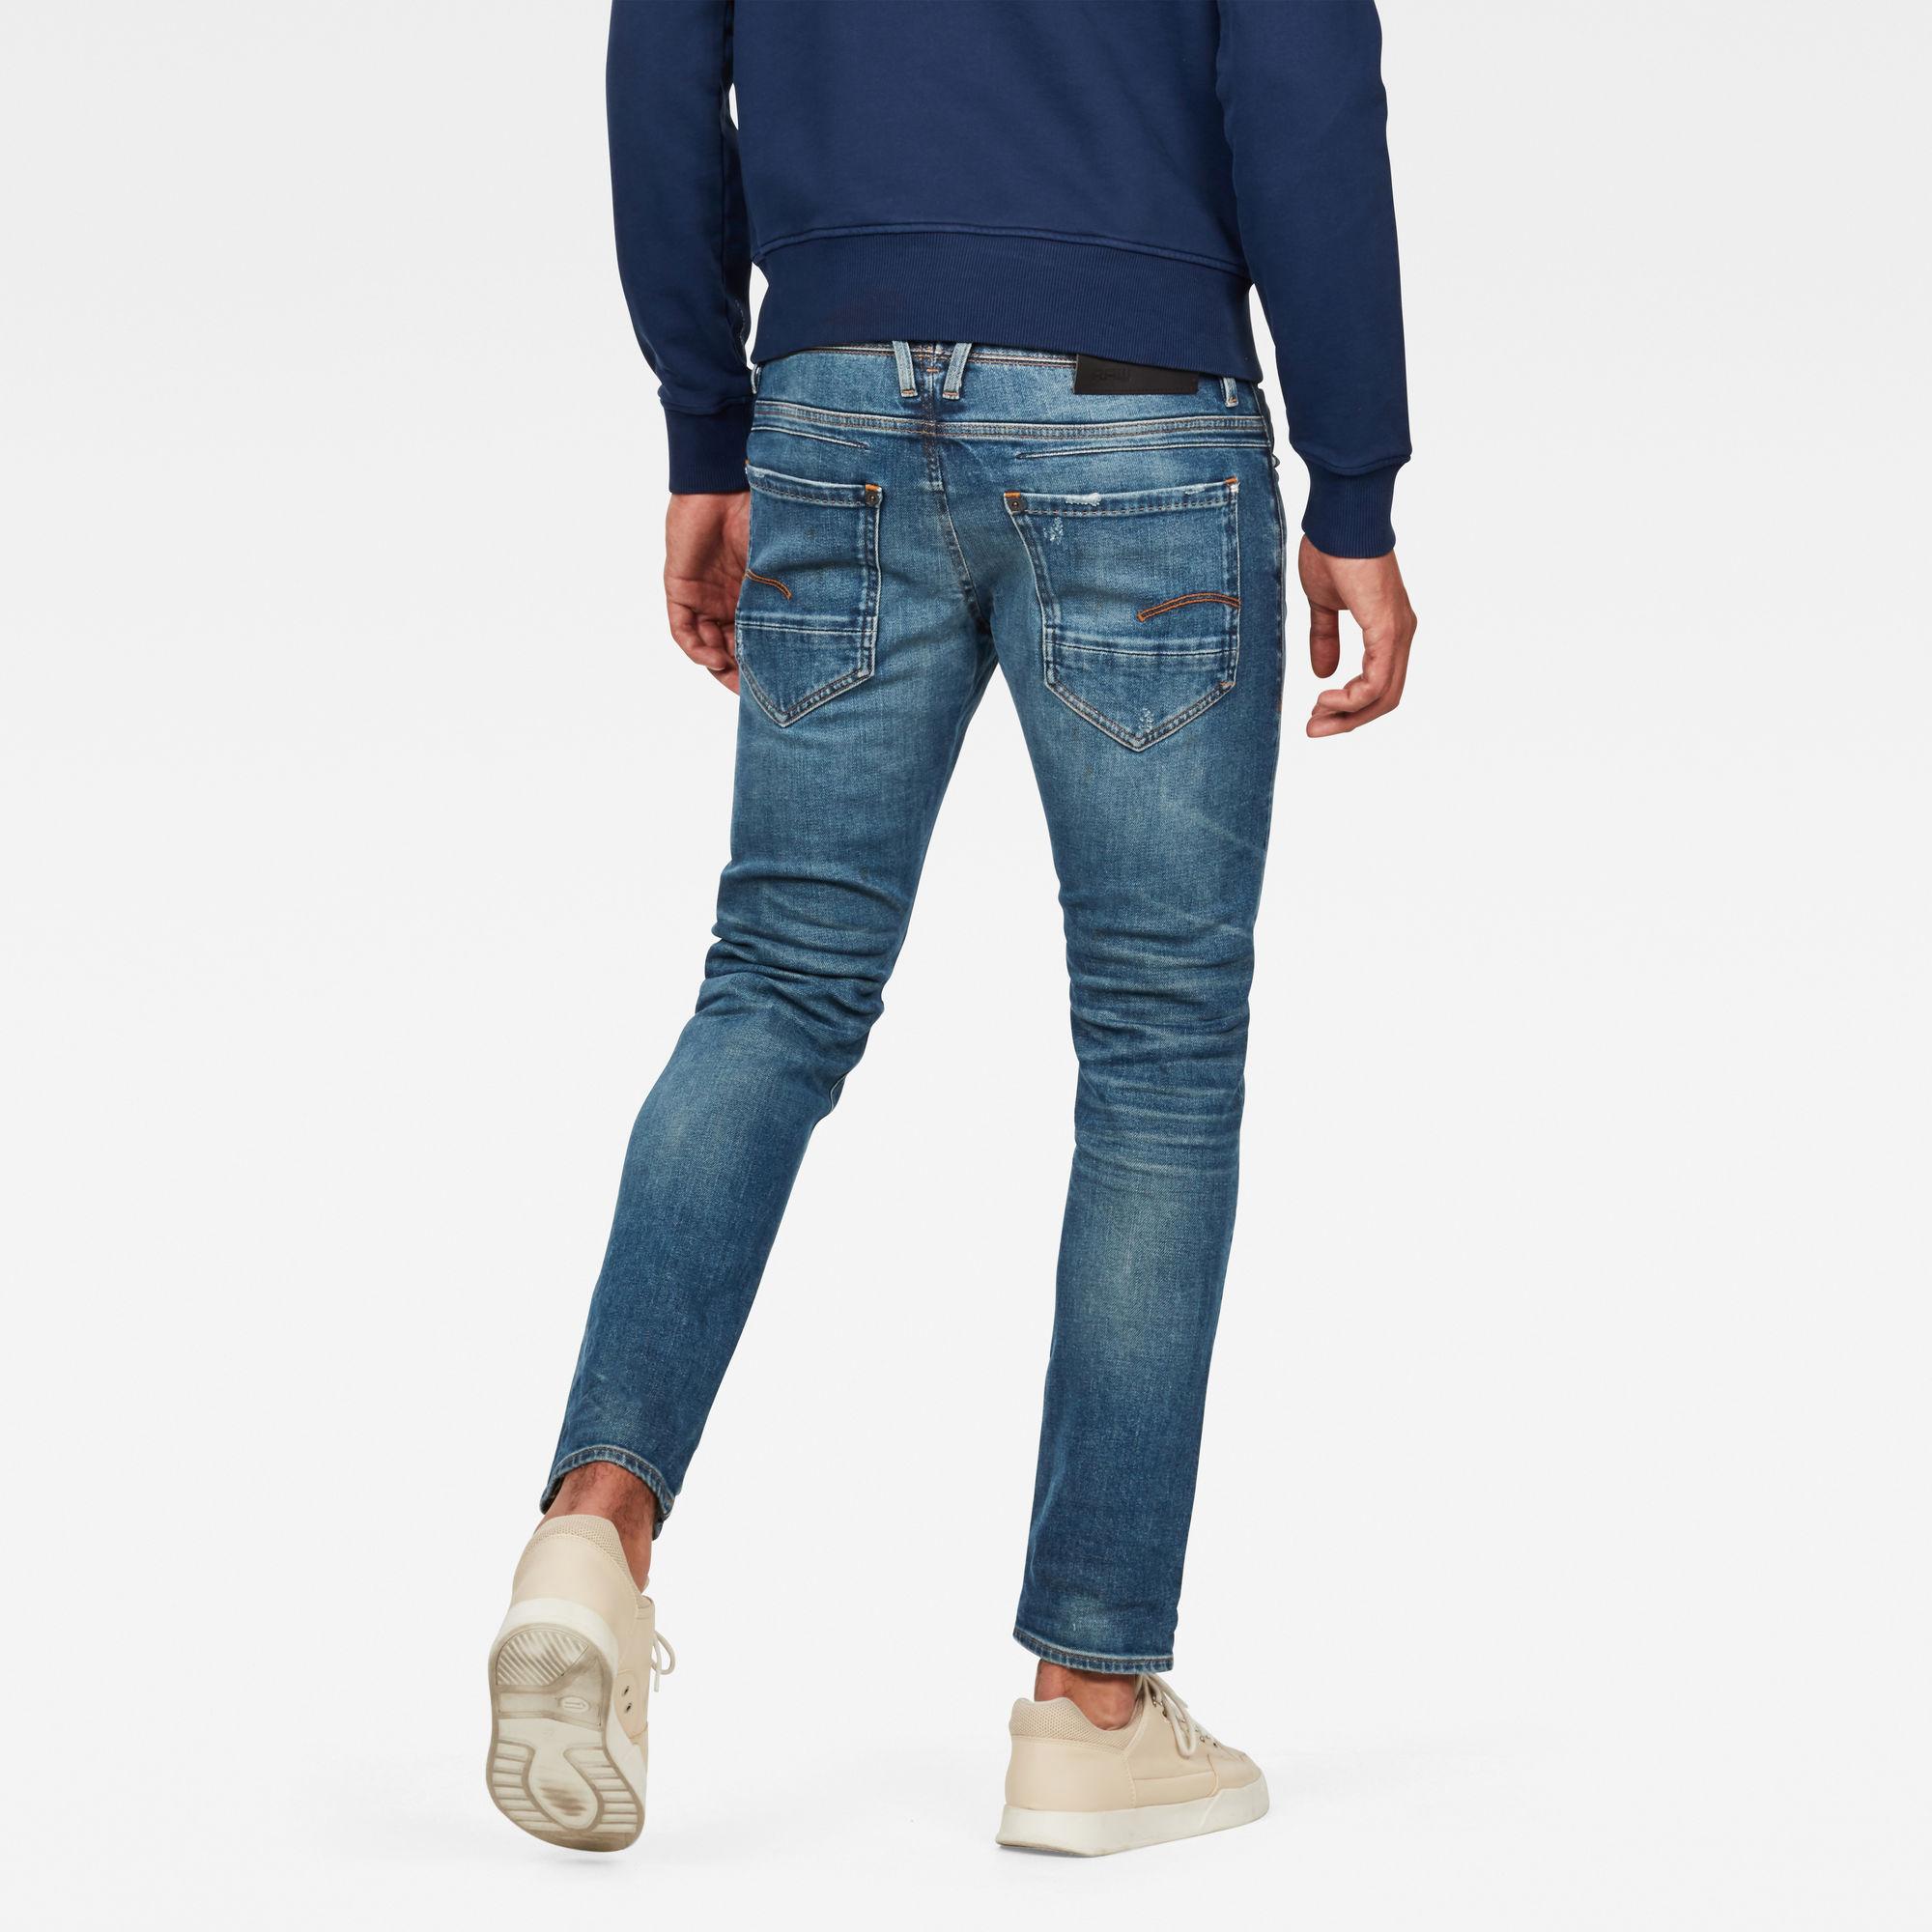 Moddan D-Staq 5-Pocket Slim Jeans